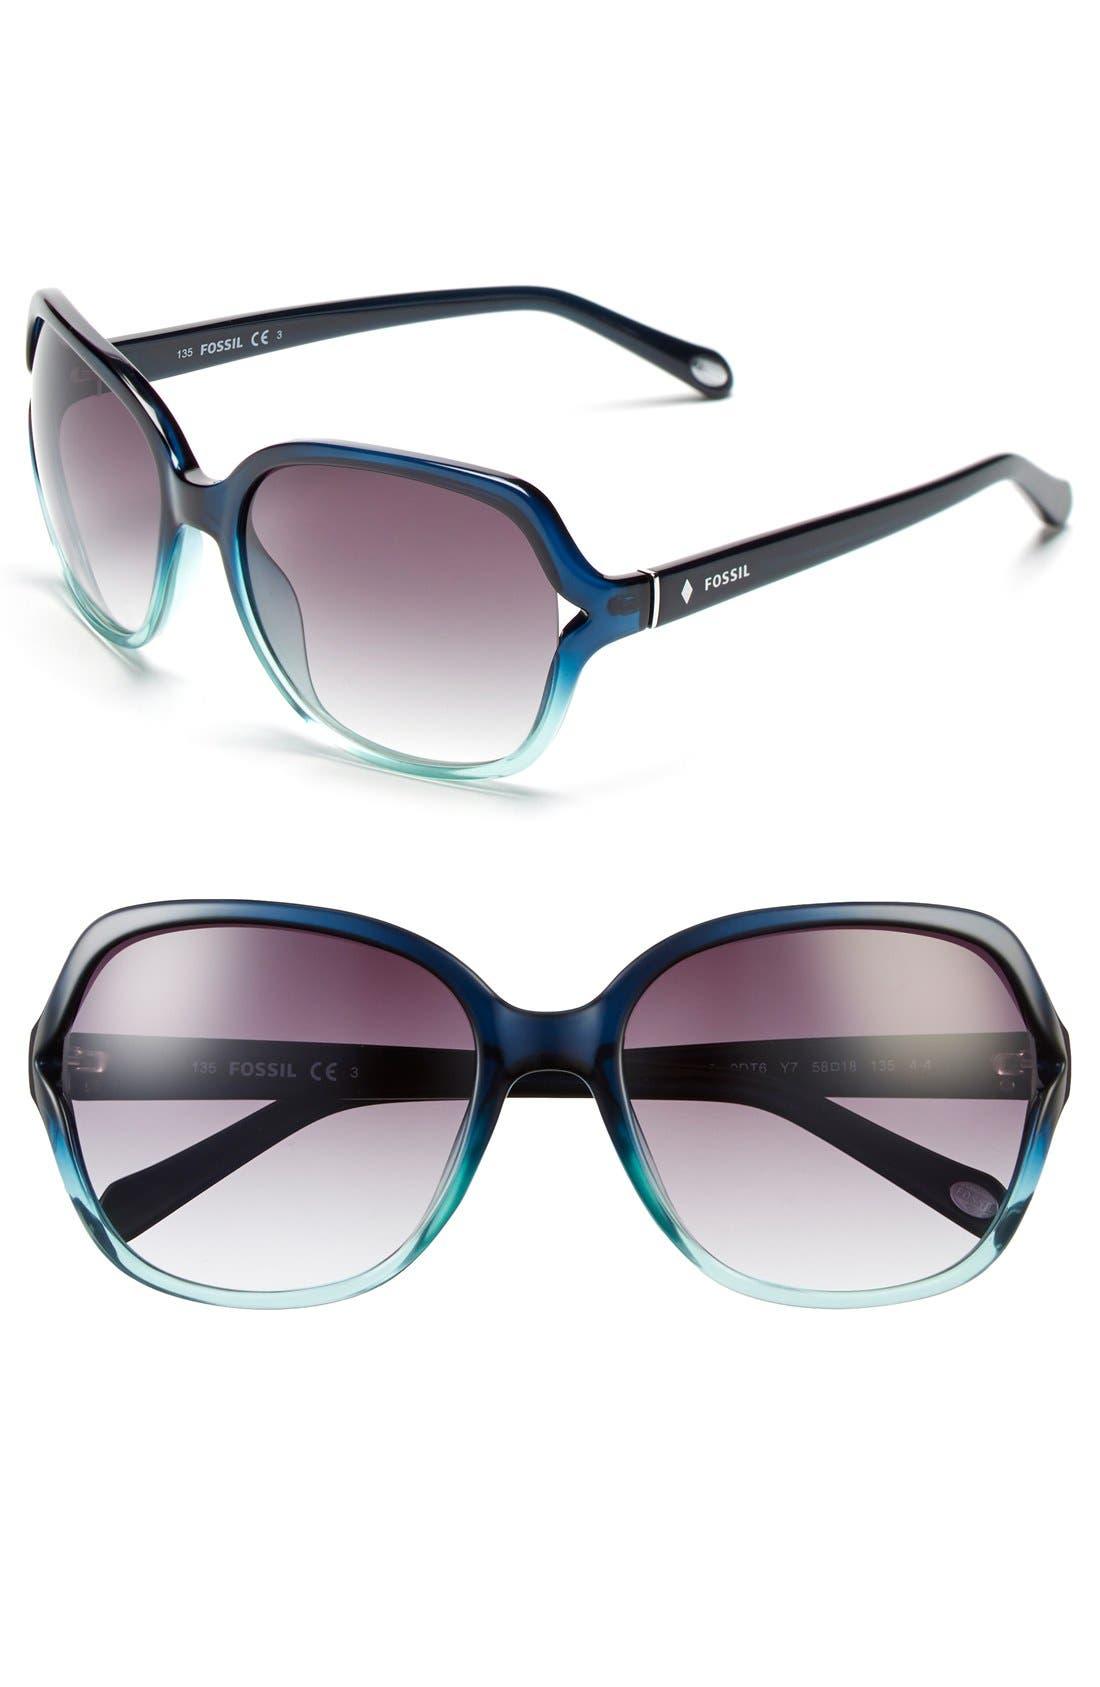 FOSSIL Jesse 58mm Oversize Sunglasses